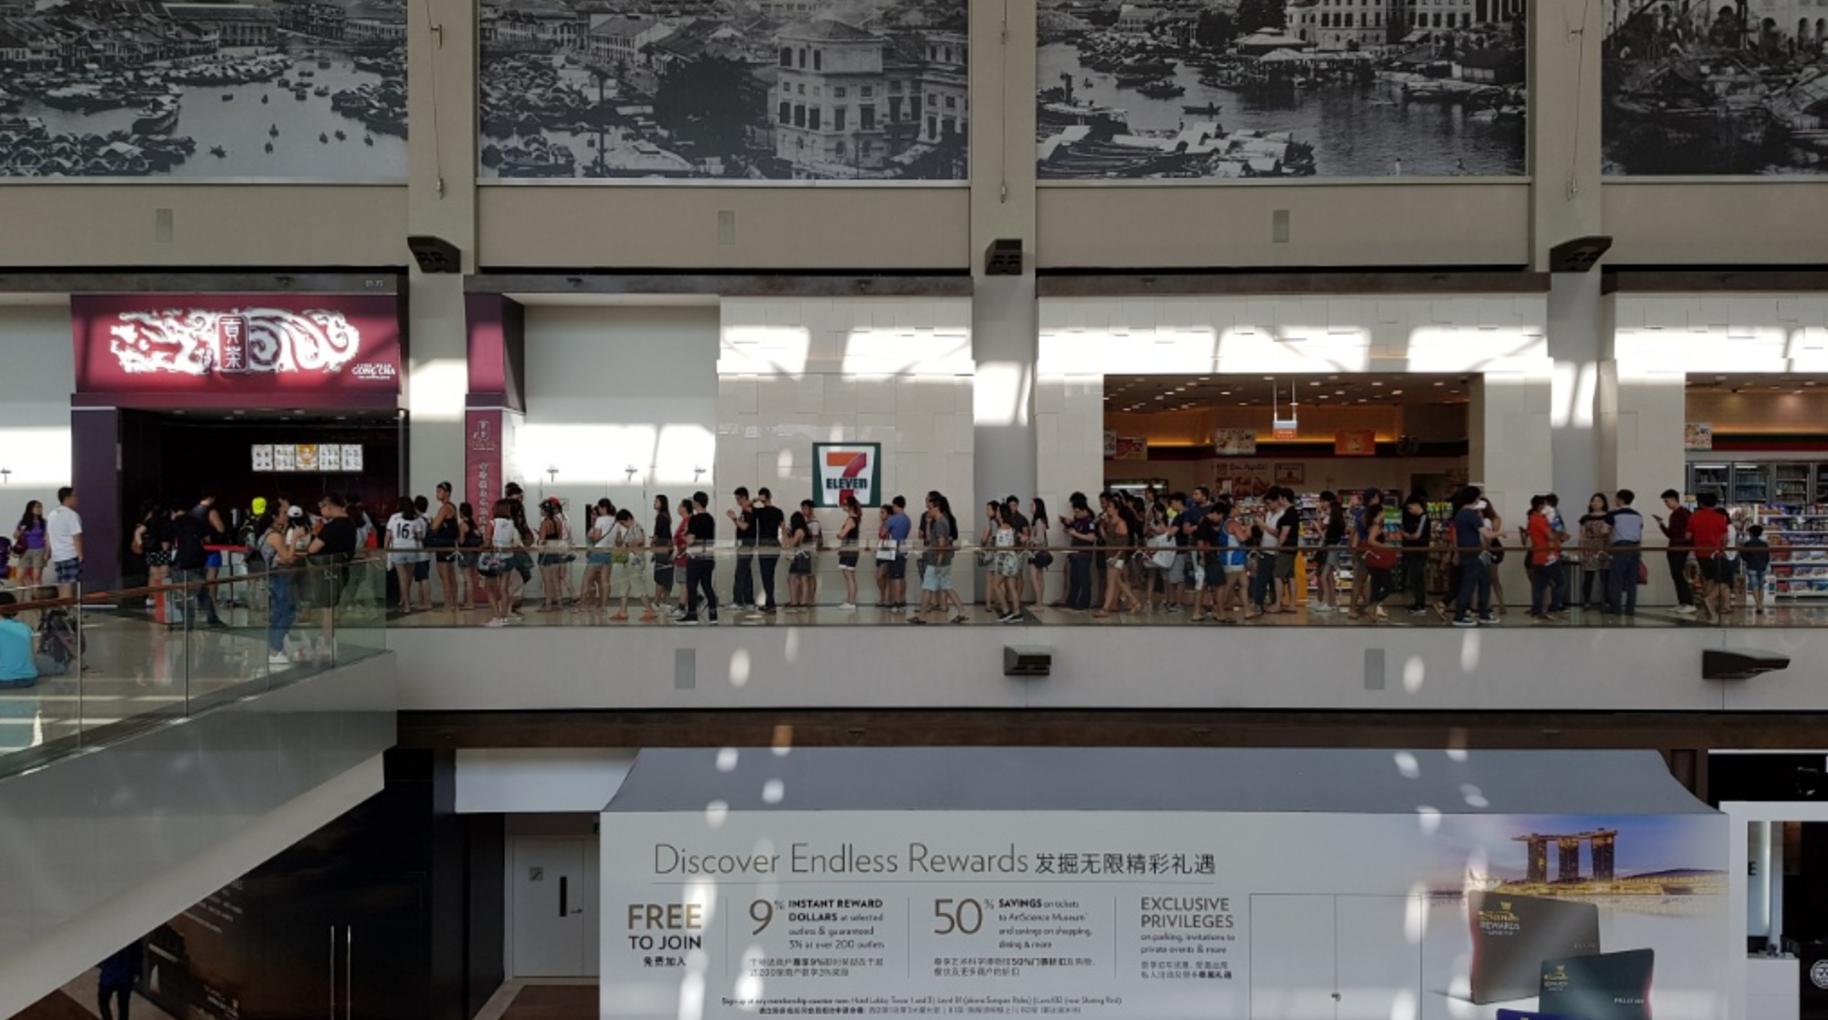 The queue on Gong Cha's last day at Marina Bay Sands. Image credit: vulcanpost.com